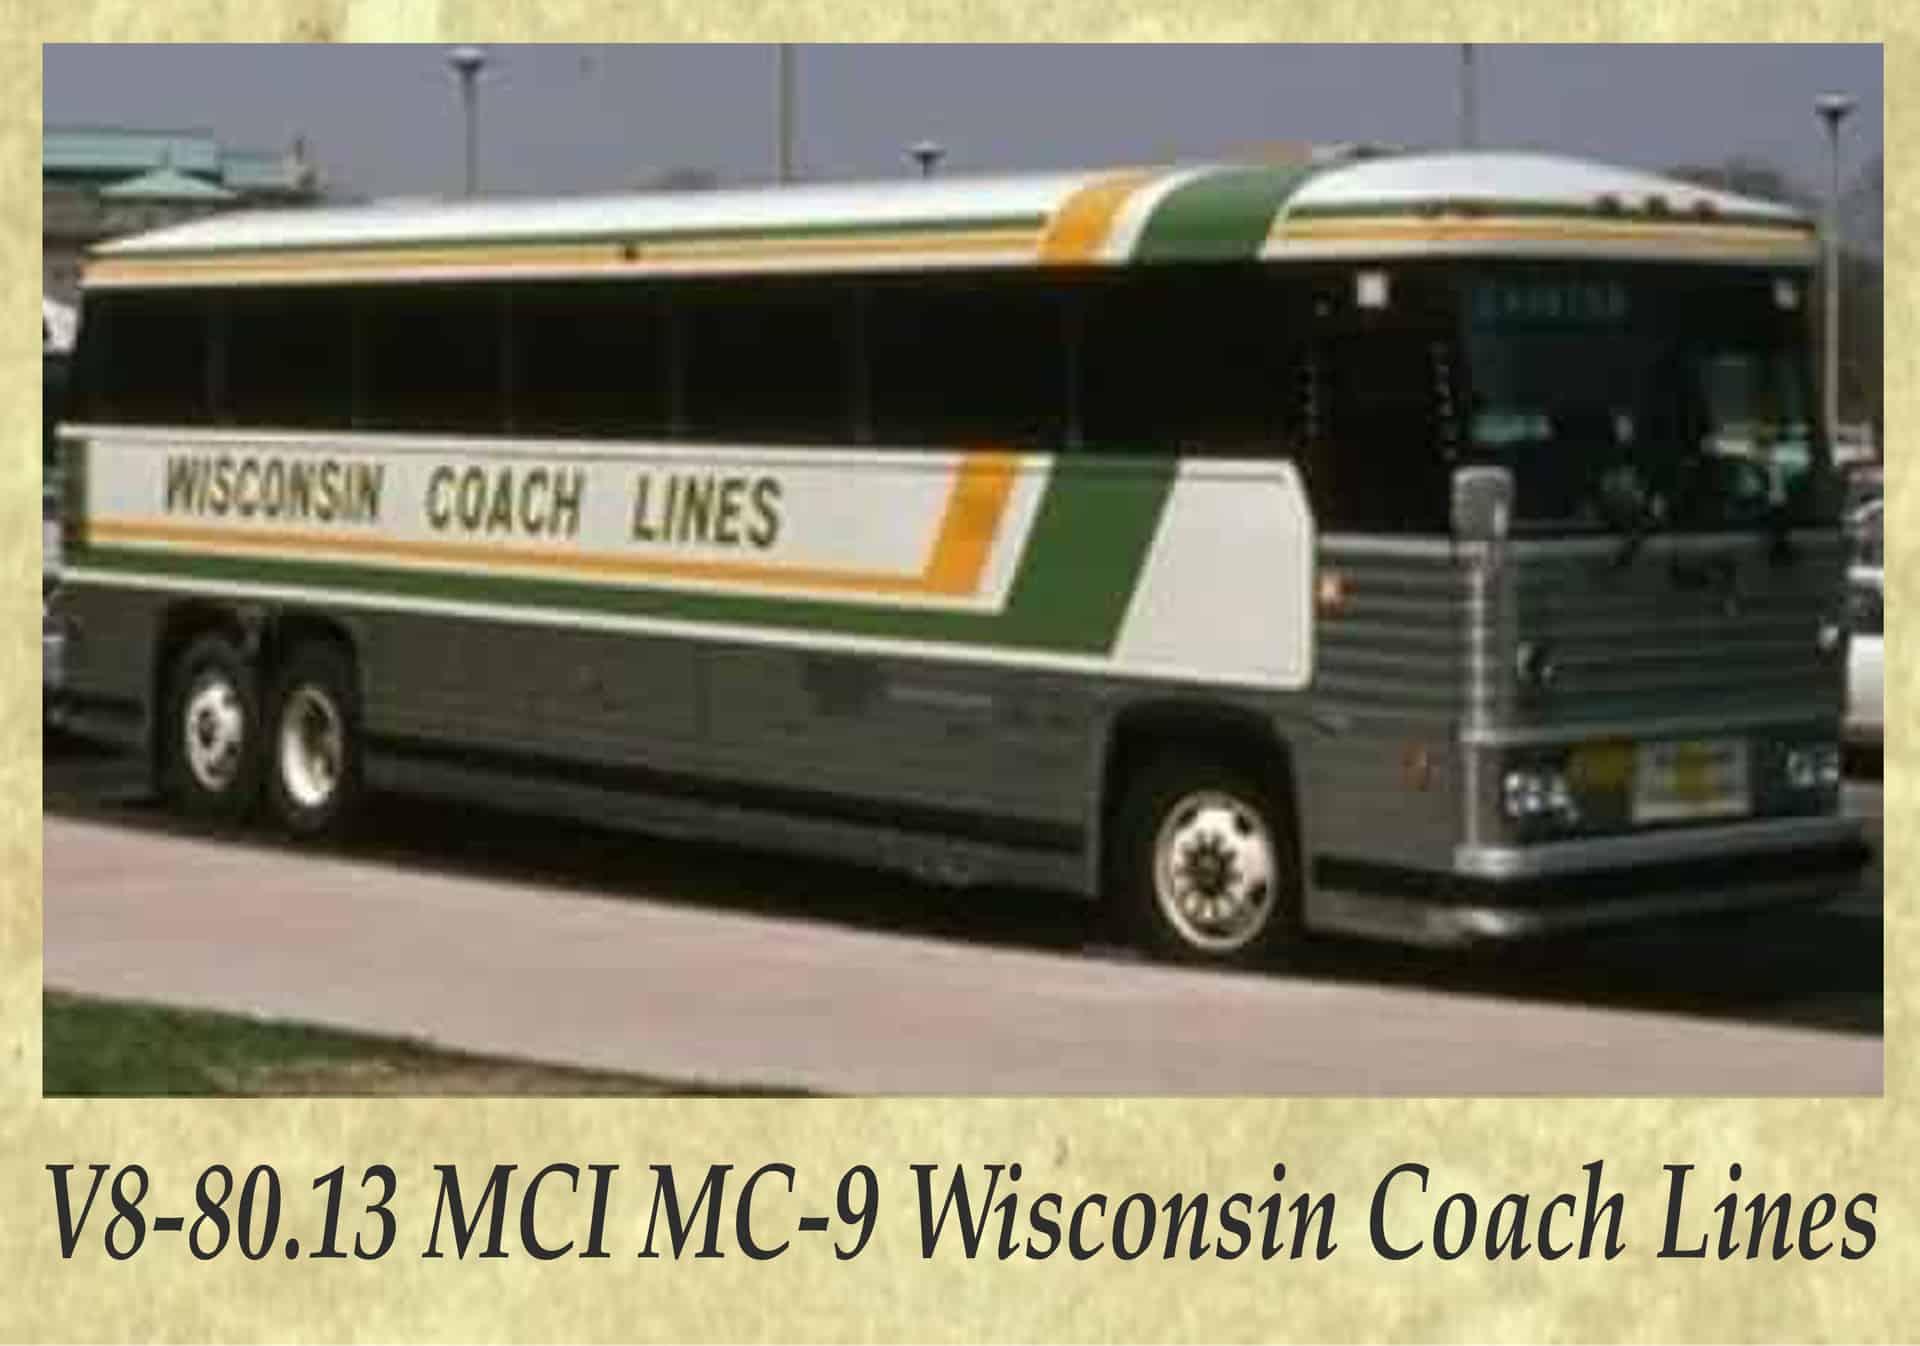 V8-80.13 MCI MC-9 Wisconsin Coach Lines